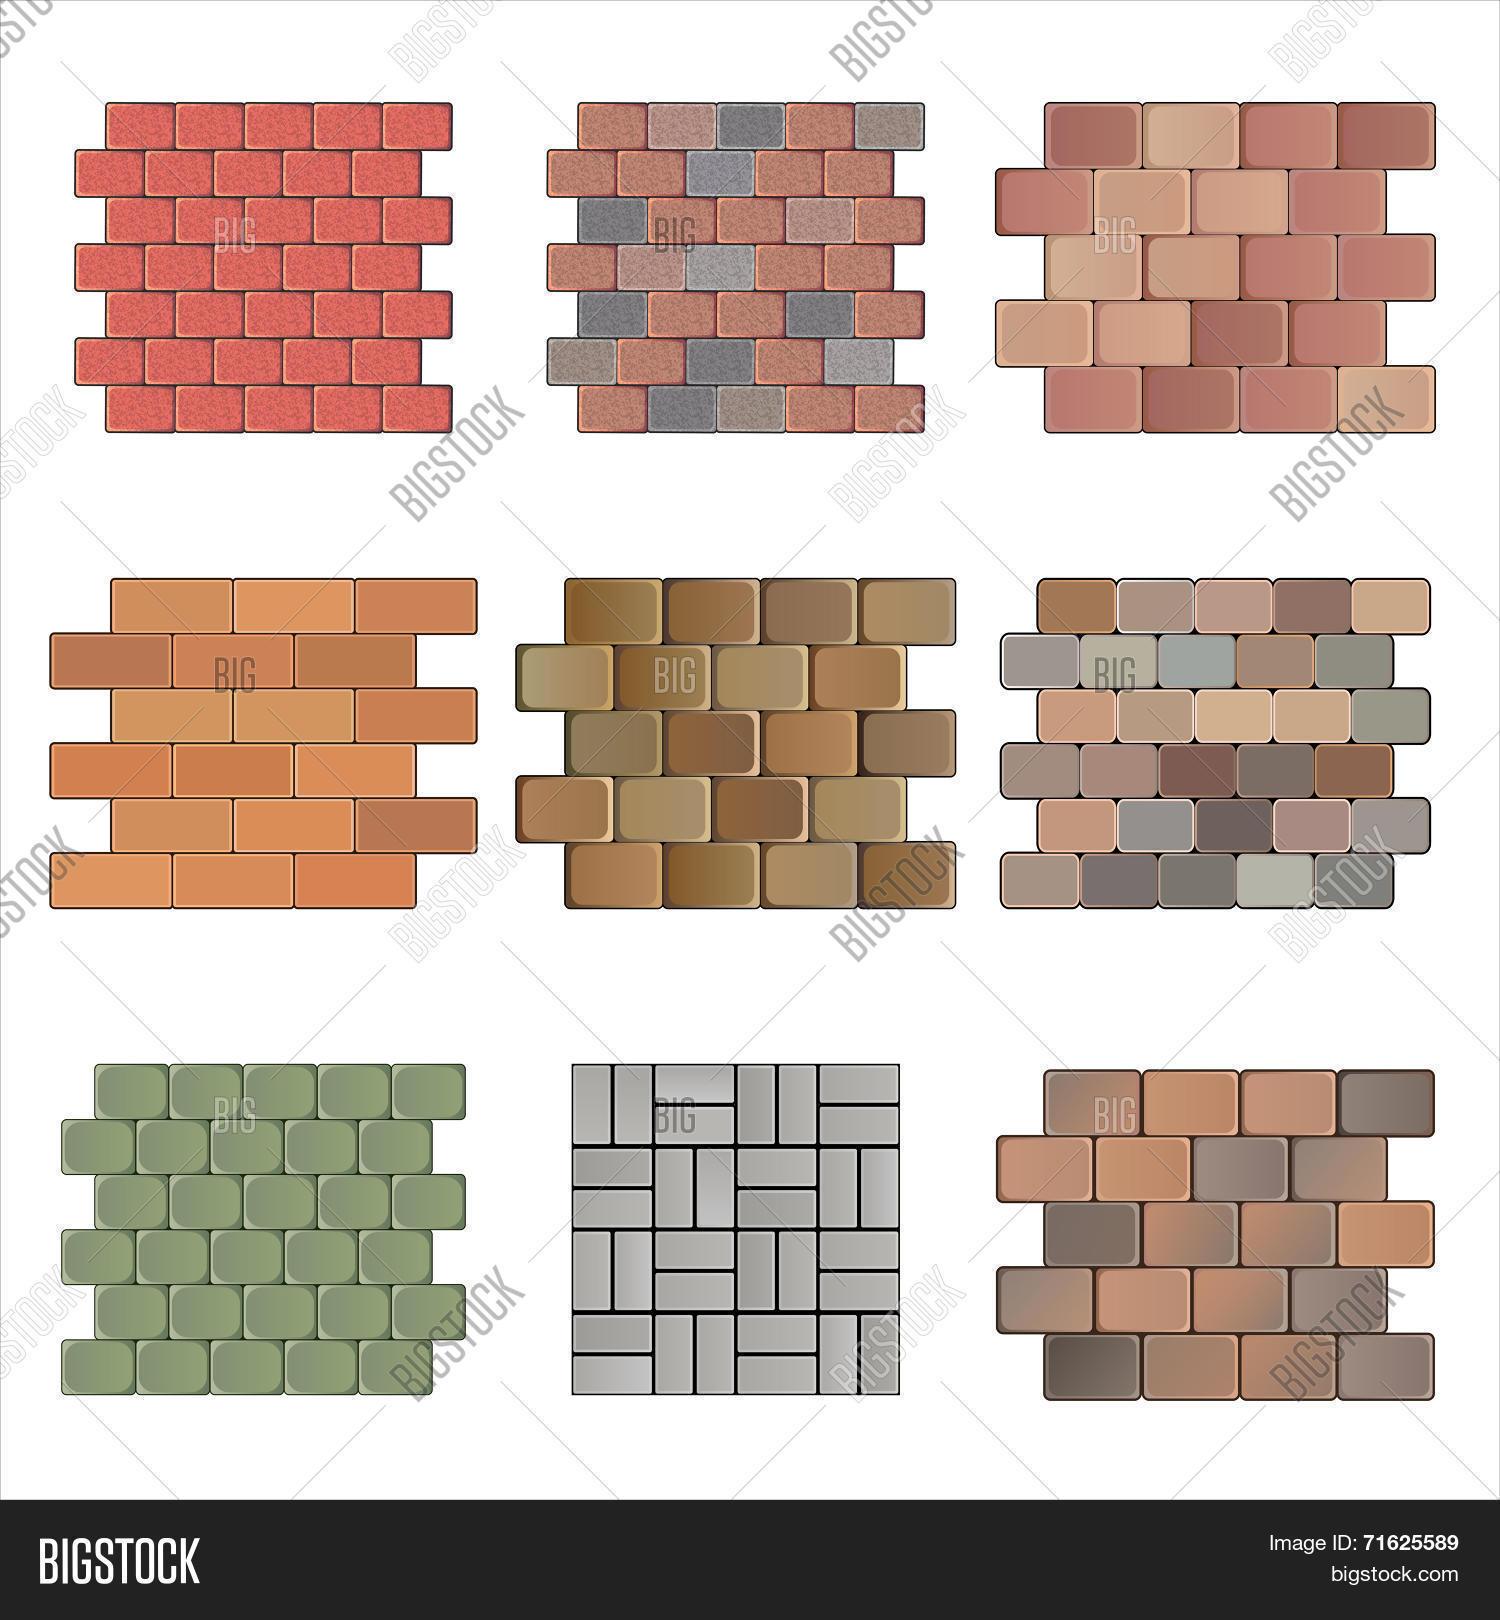 Paving stone vector photo bigstock for Paving planner